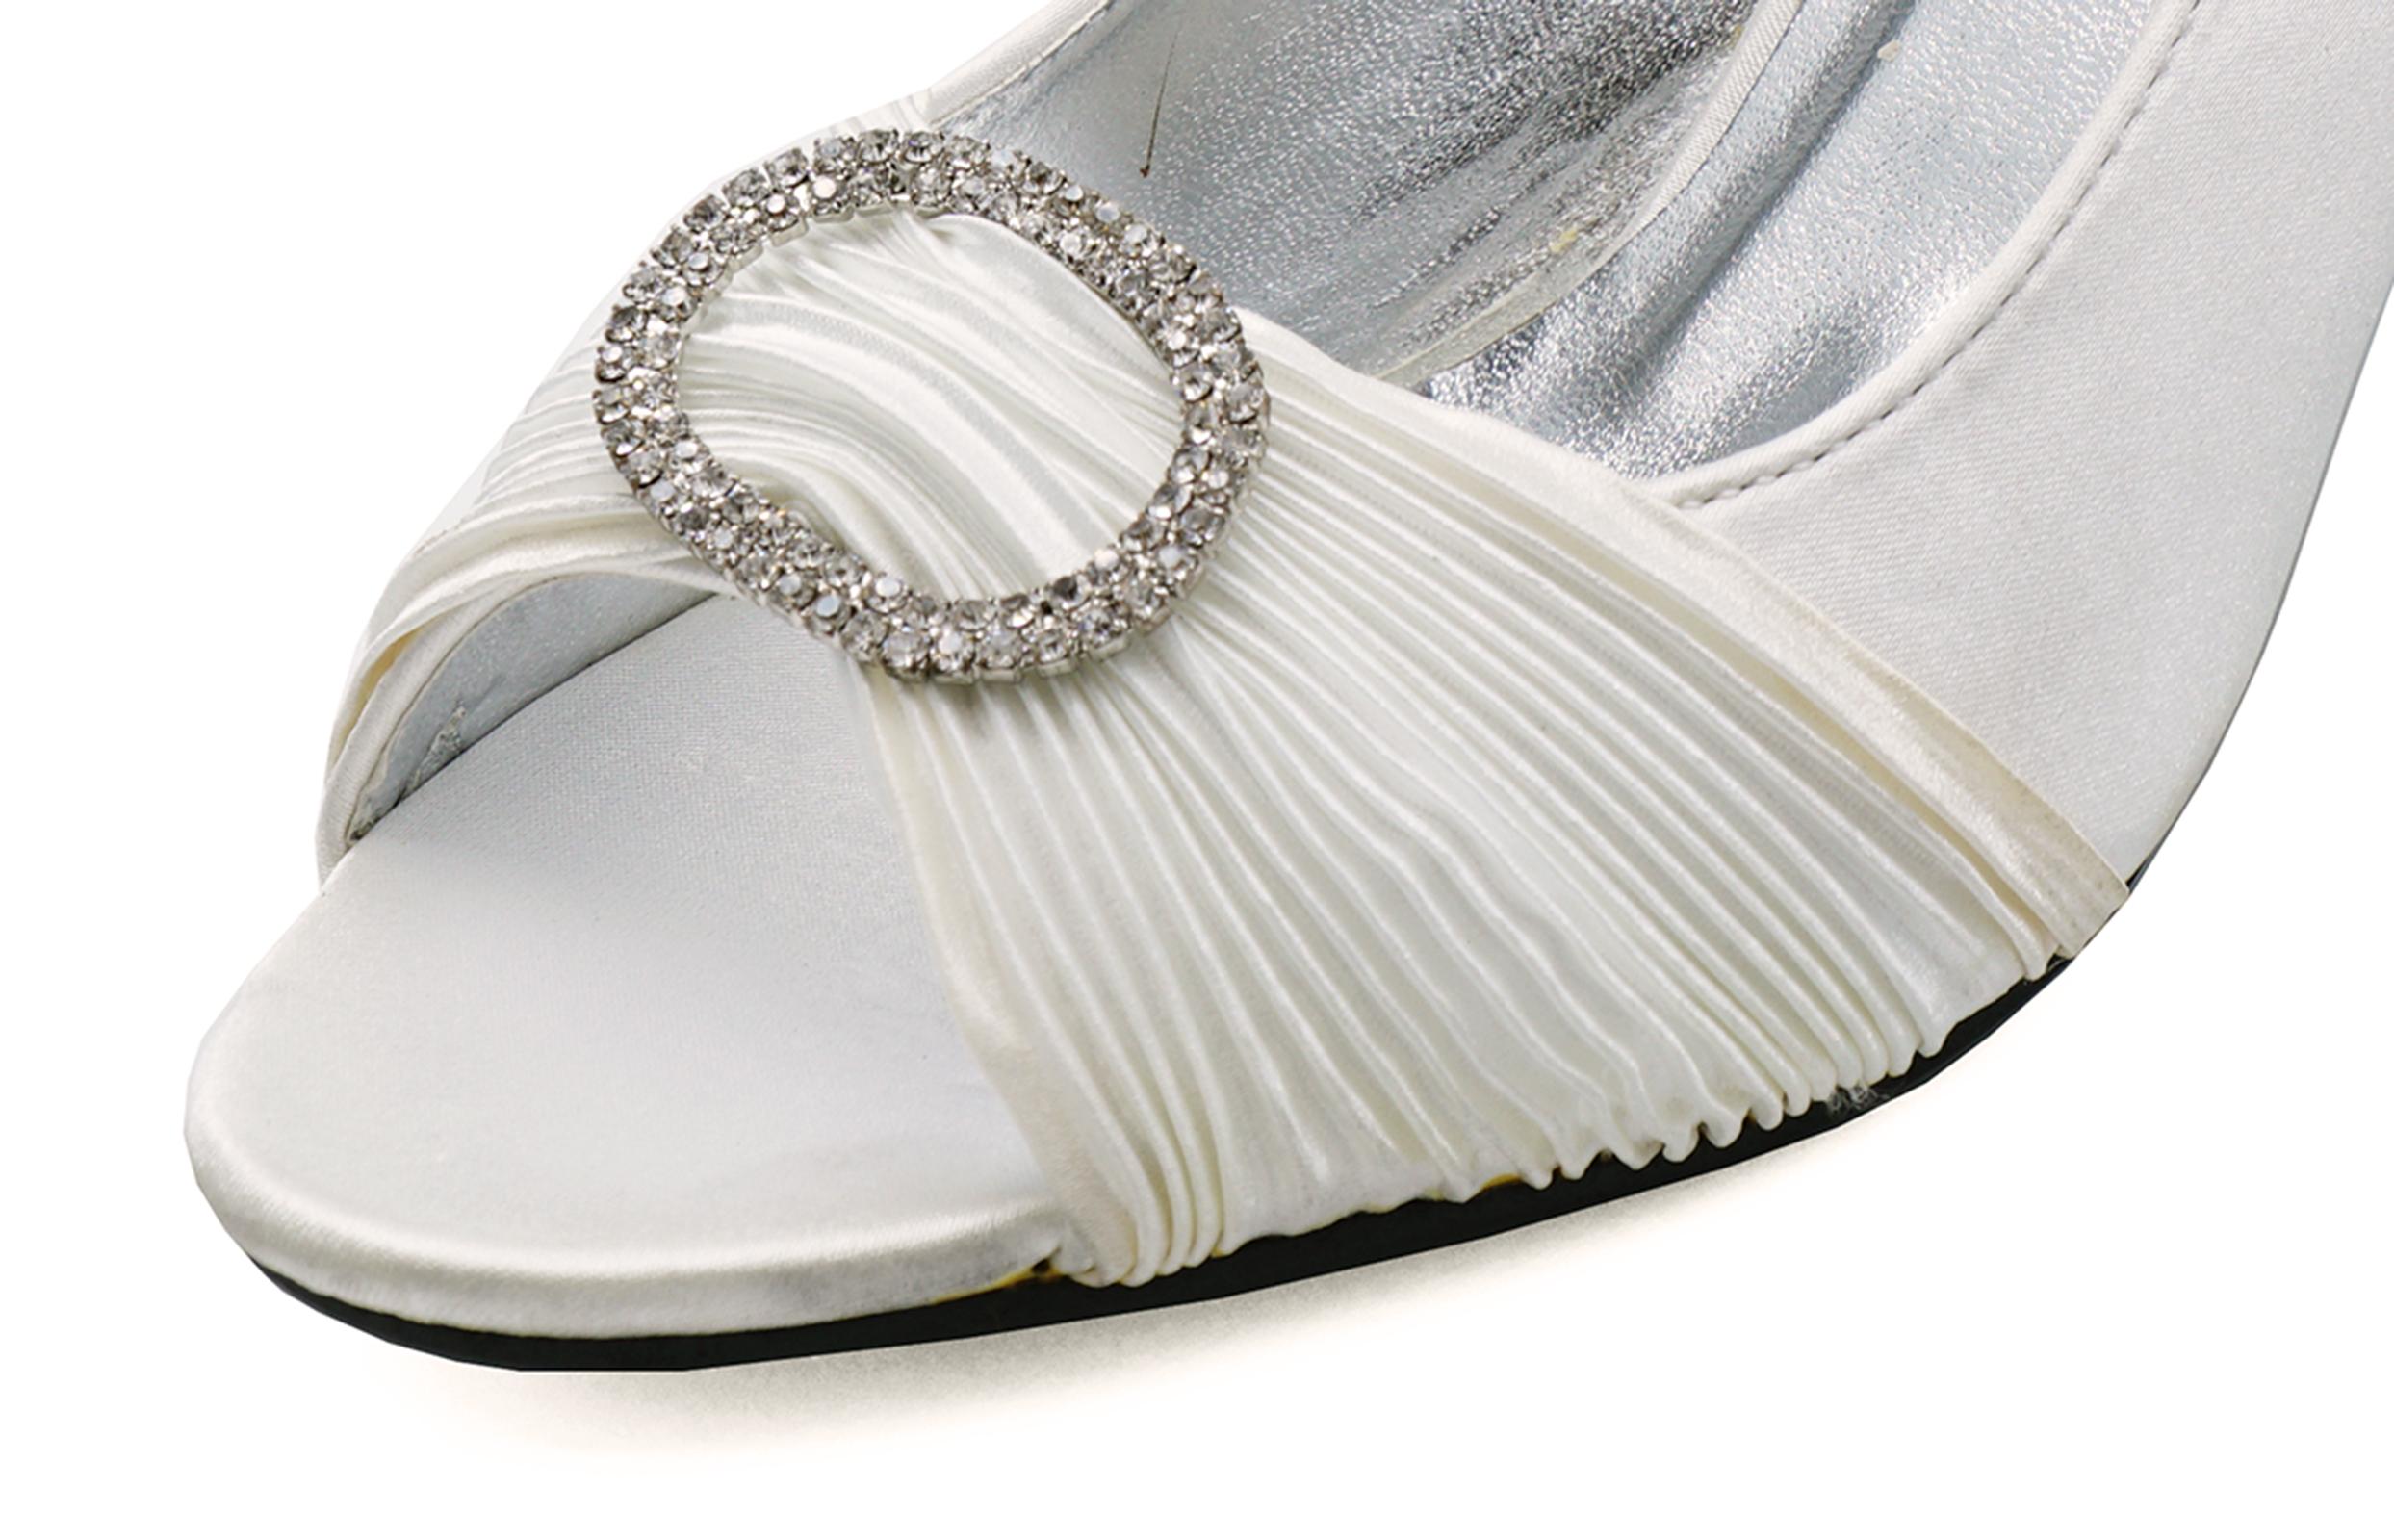 af4fb97d39eb Sentinel WOMENS IVORY SATIN BRIDAL BRIDE BRIDESMAID WEDDING COURT SHOES 3-8  [SECONDS]